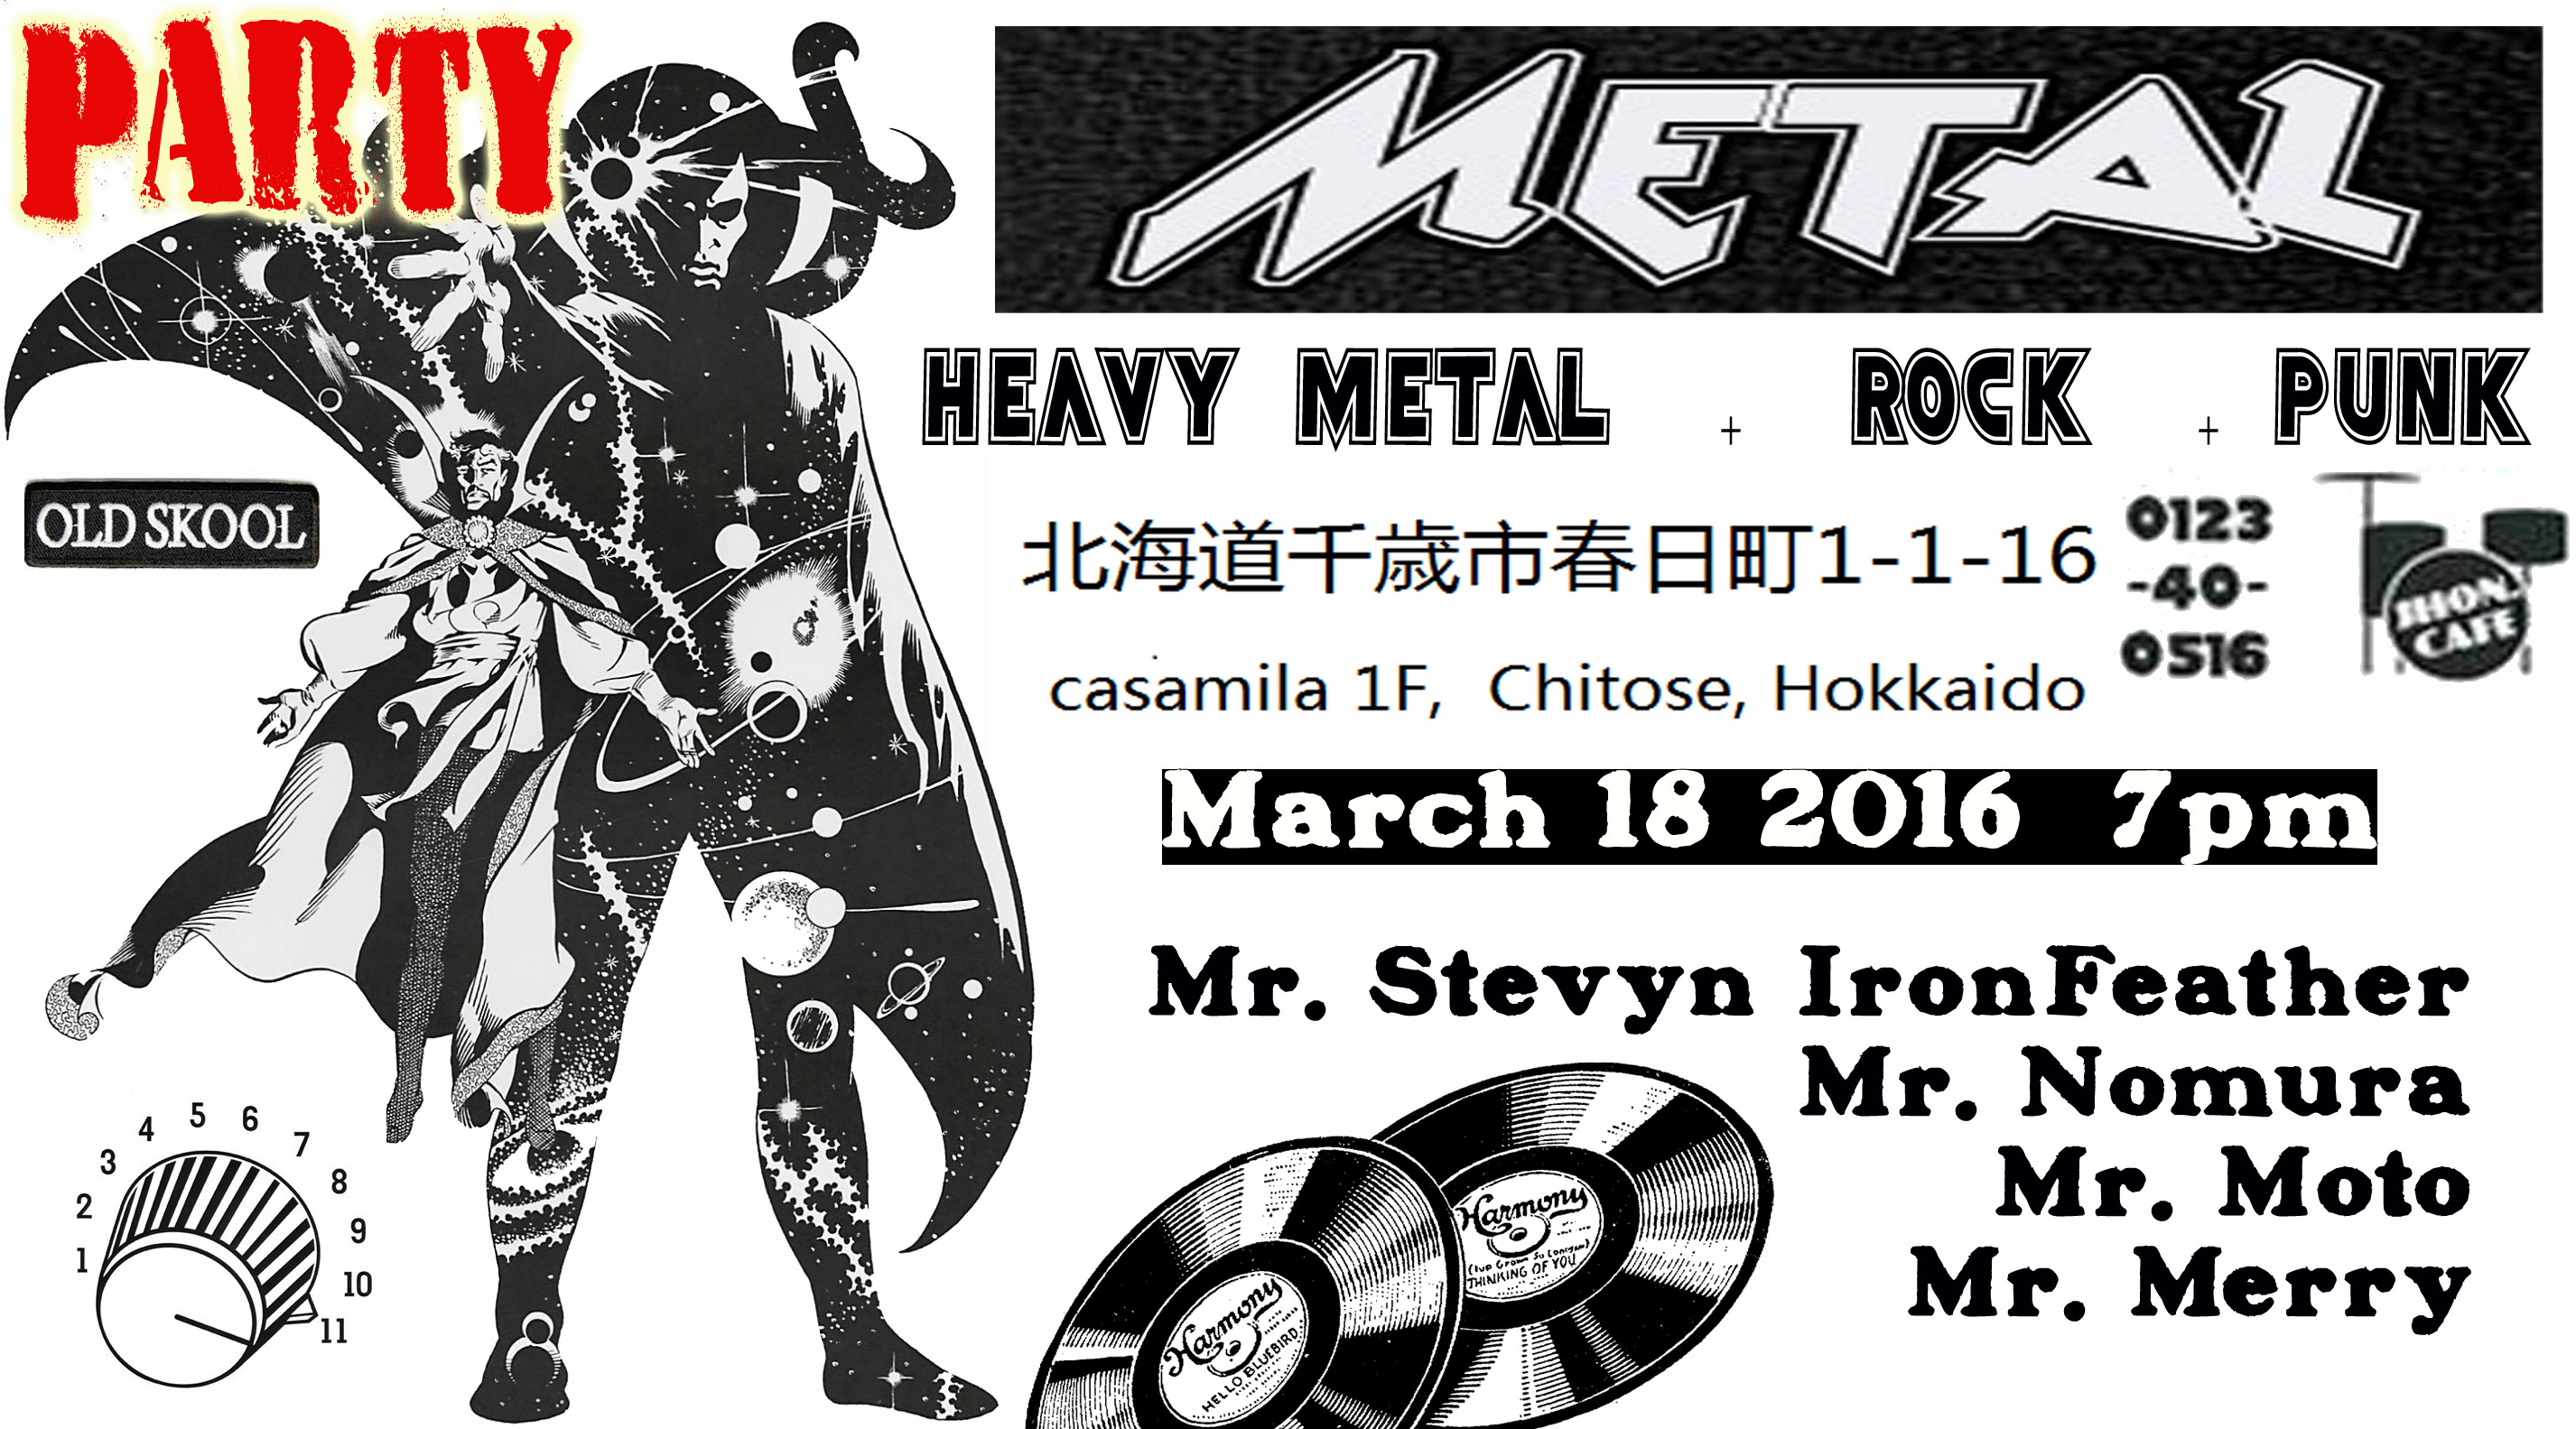 hokkaido metal rock music party